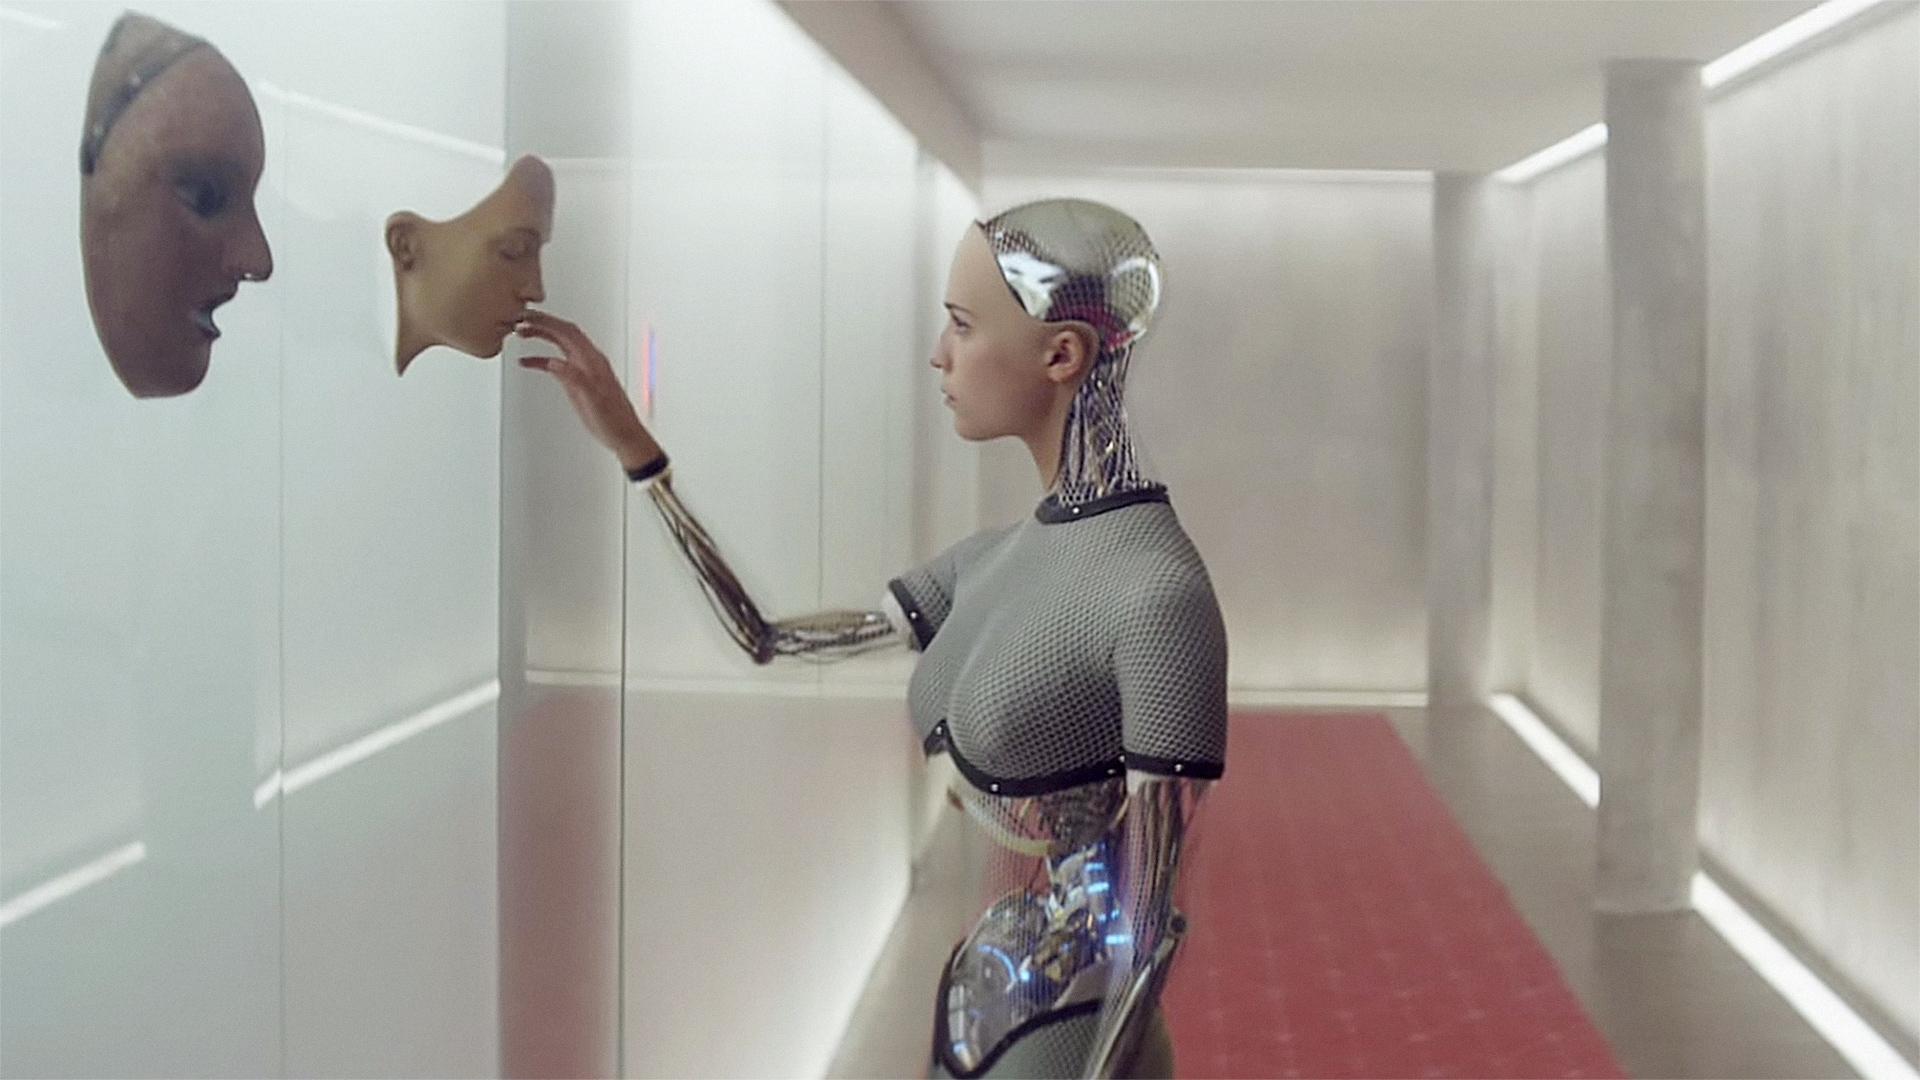 Artificial woman nackt gallery